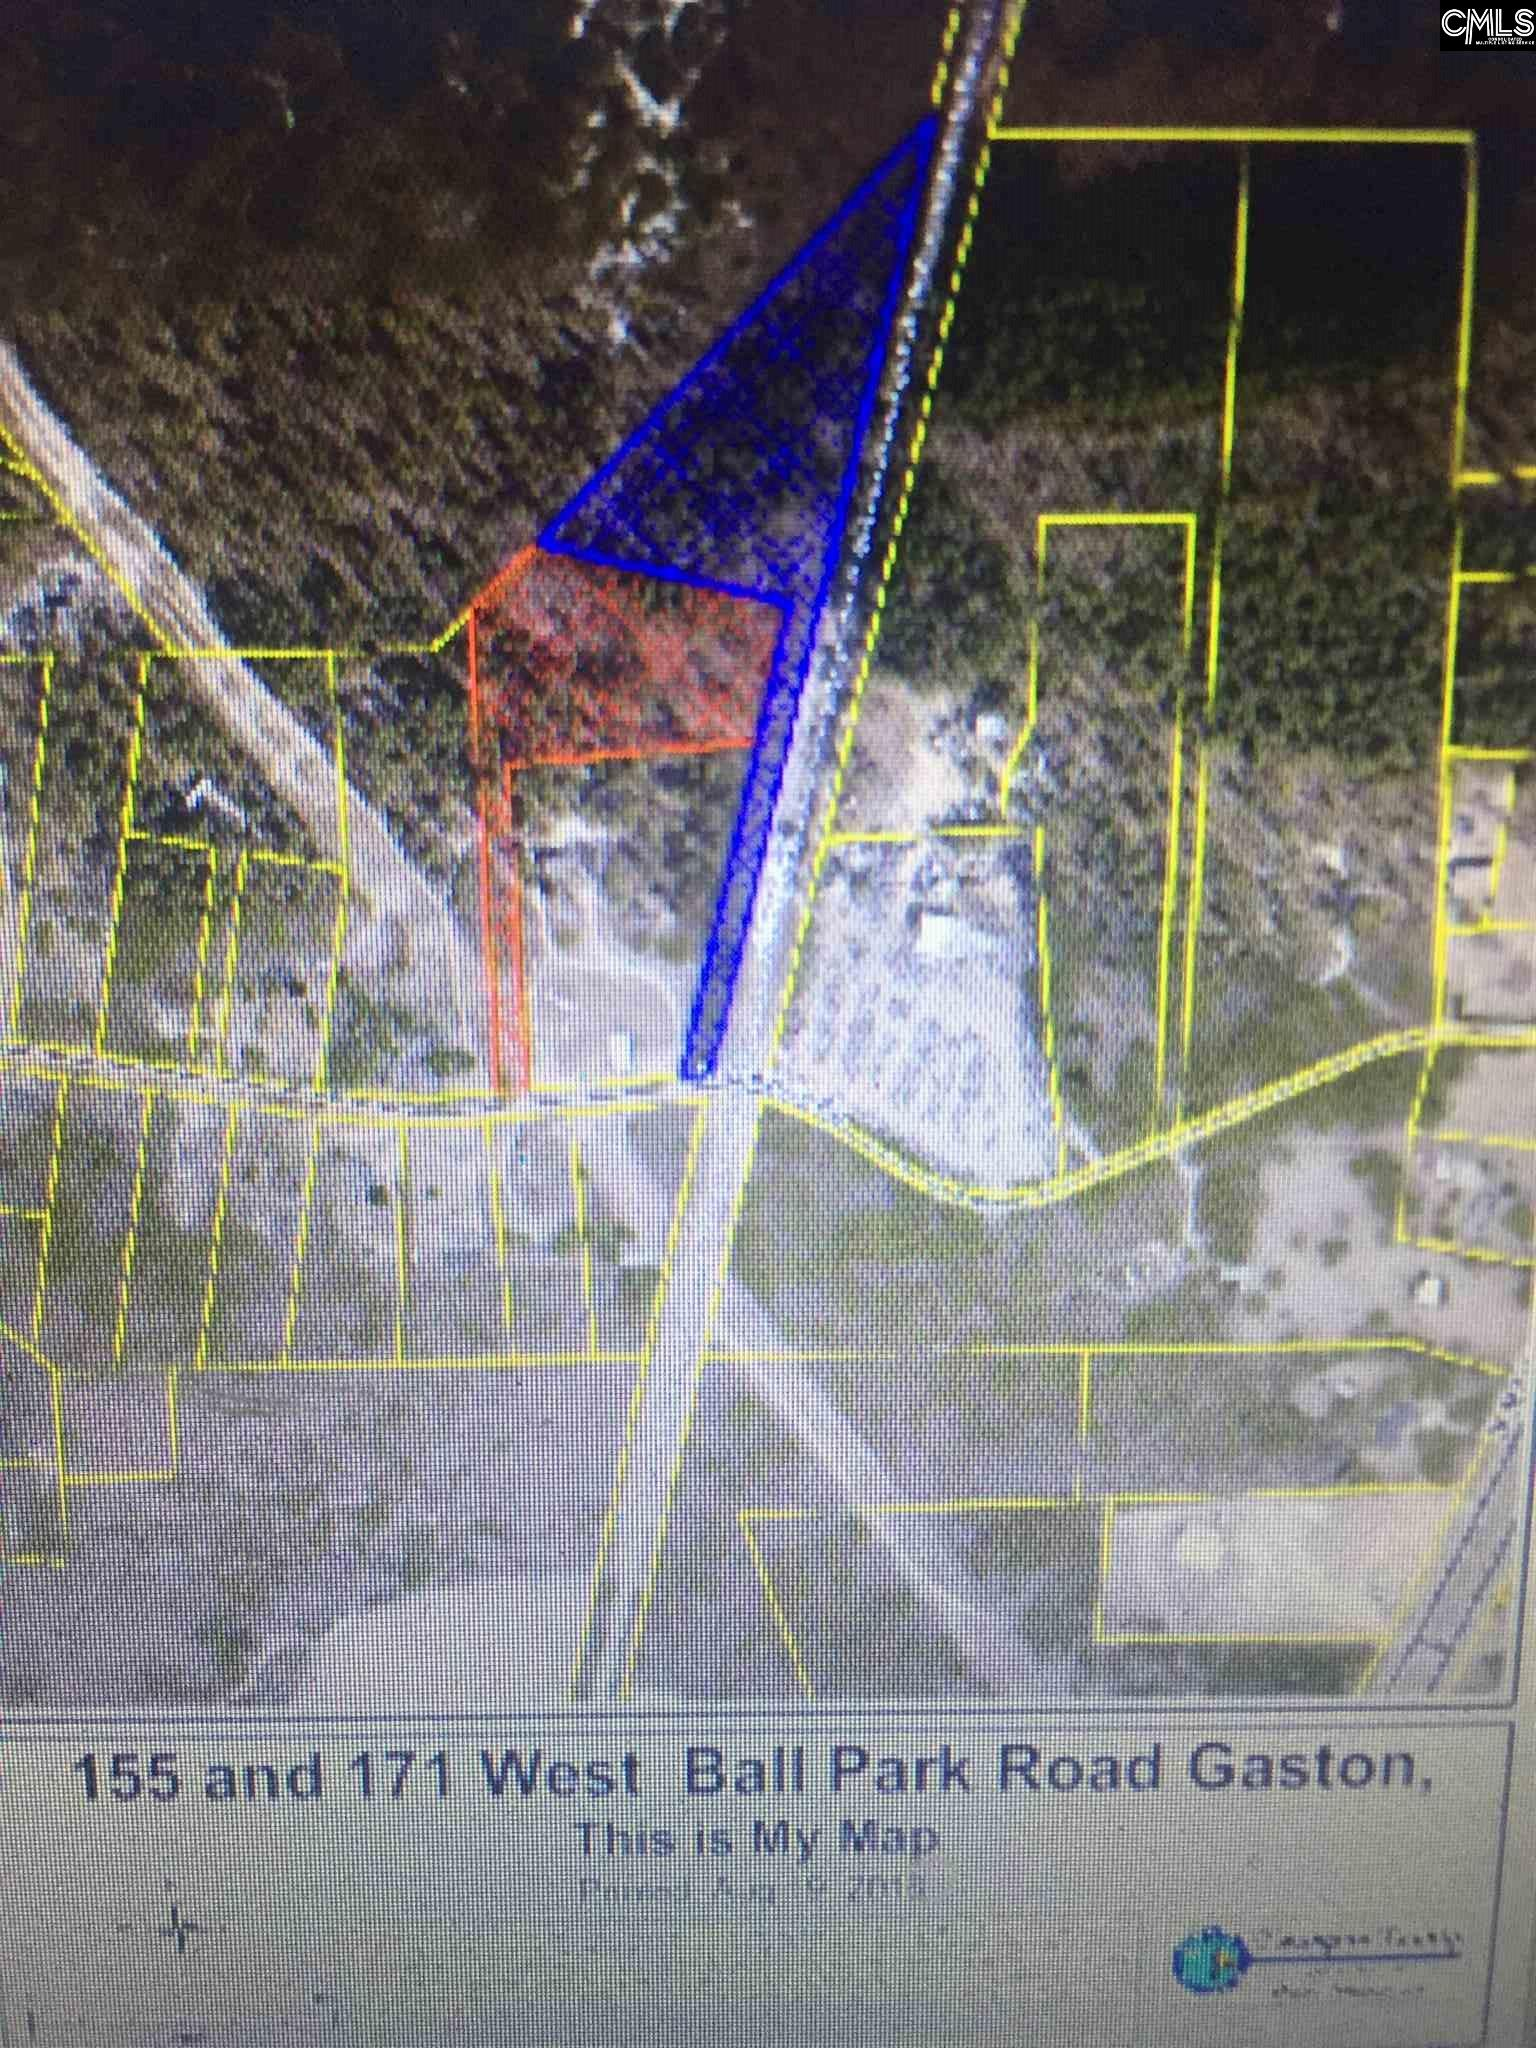 155 W Ball Park #12 14 Gaston, SC 29053